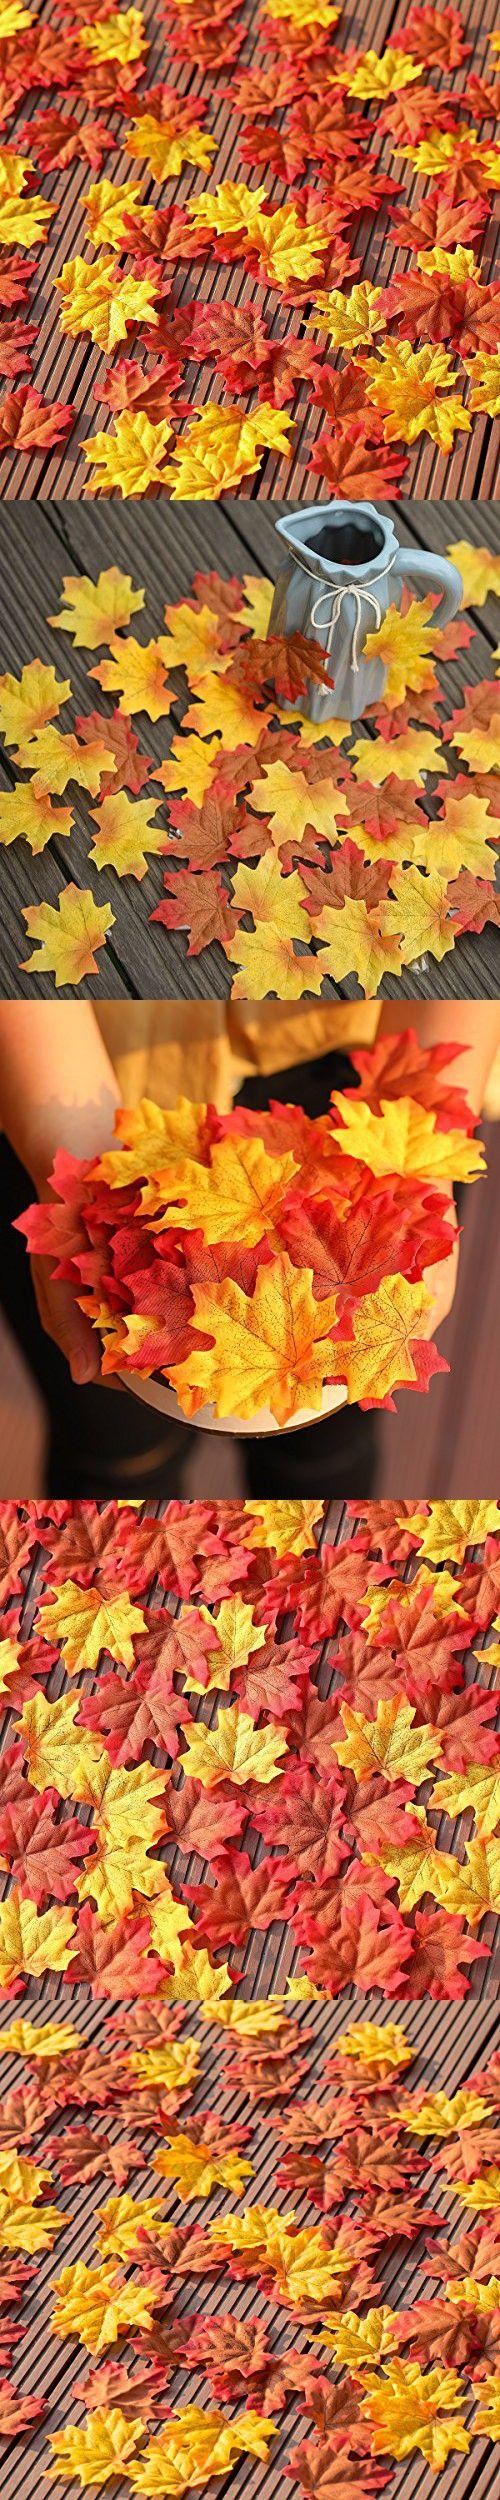 PARTY JOY 400pcs Artificial Maple Leaves Autumn Colored For Scrapbooking Silk Flower Wreaths Wedding Favor Party Decoration,Mixed Color